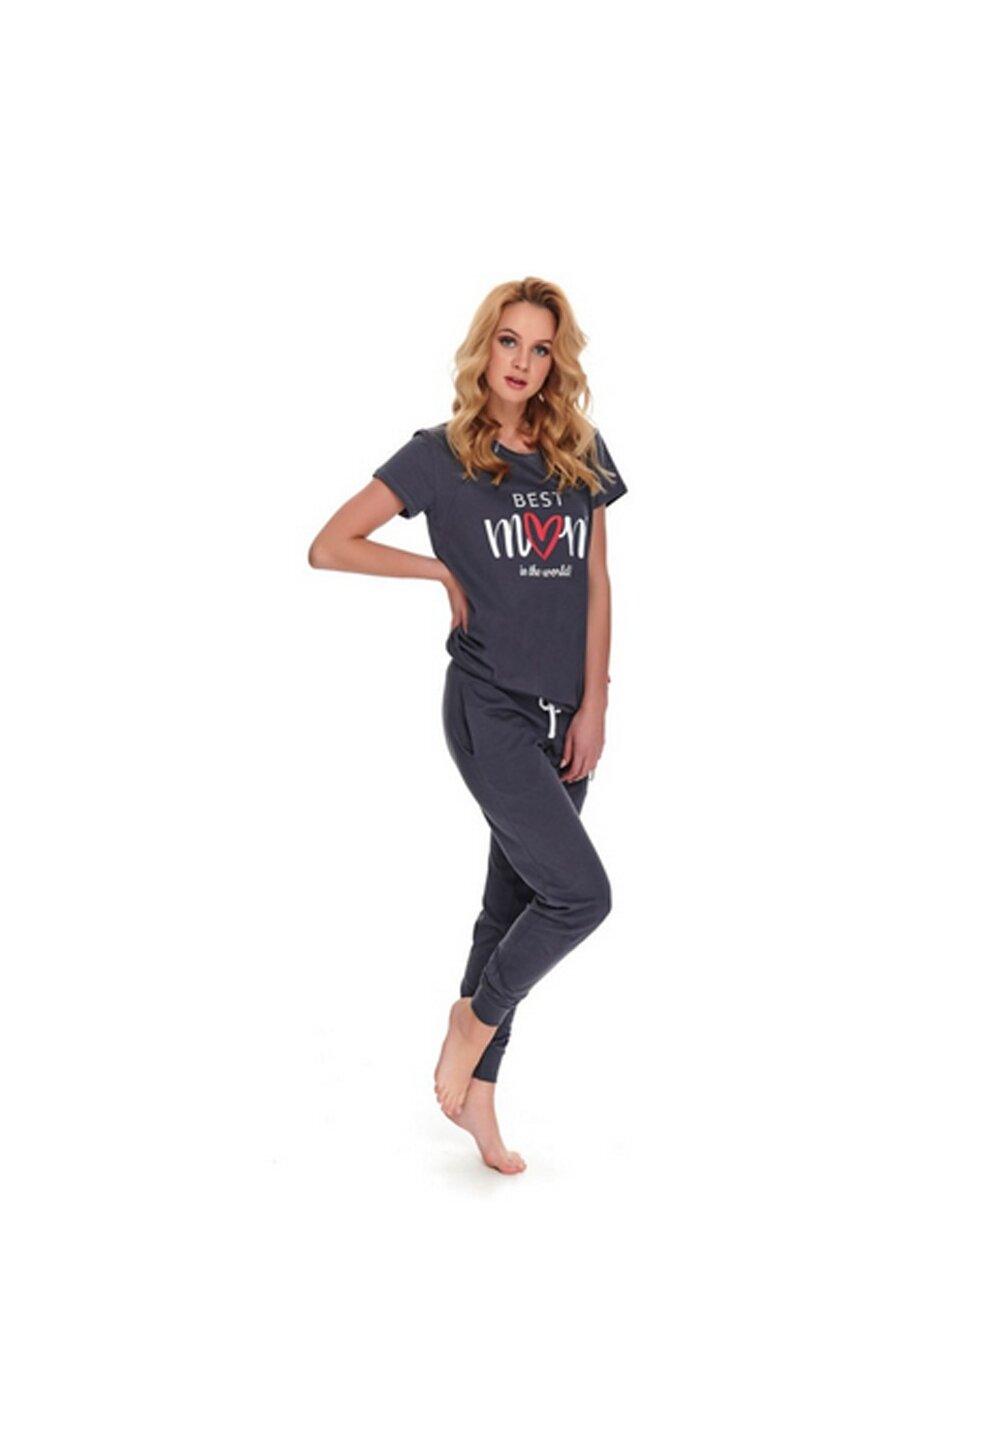 Pijama pentru alaptat, Best Mom in the world, gri inchis imagine